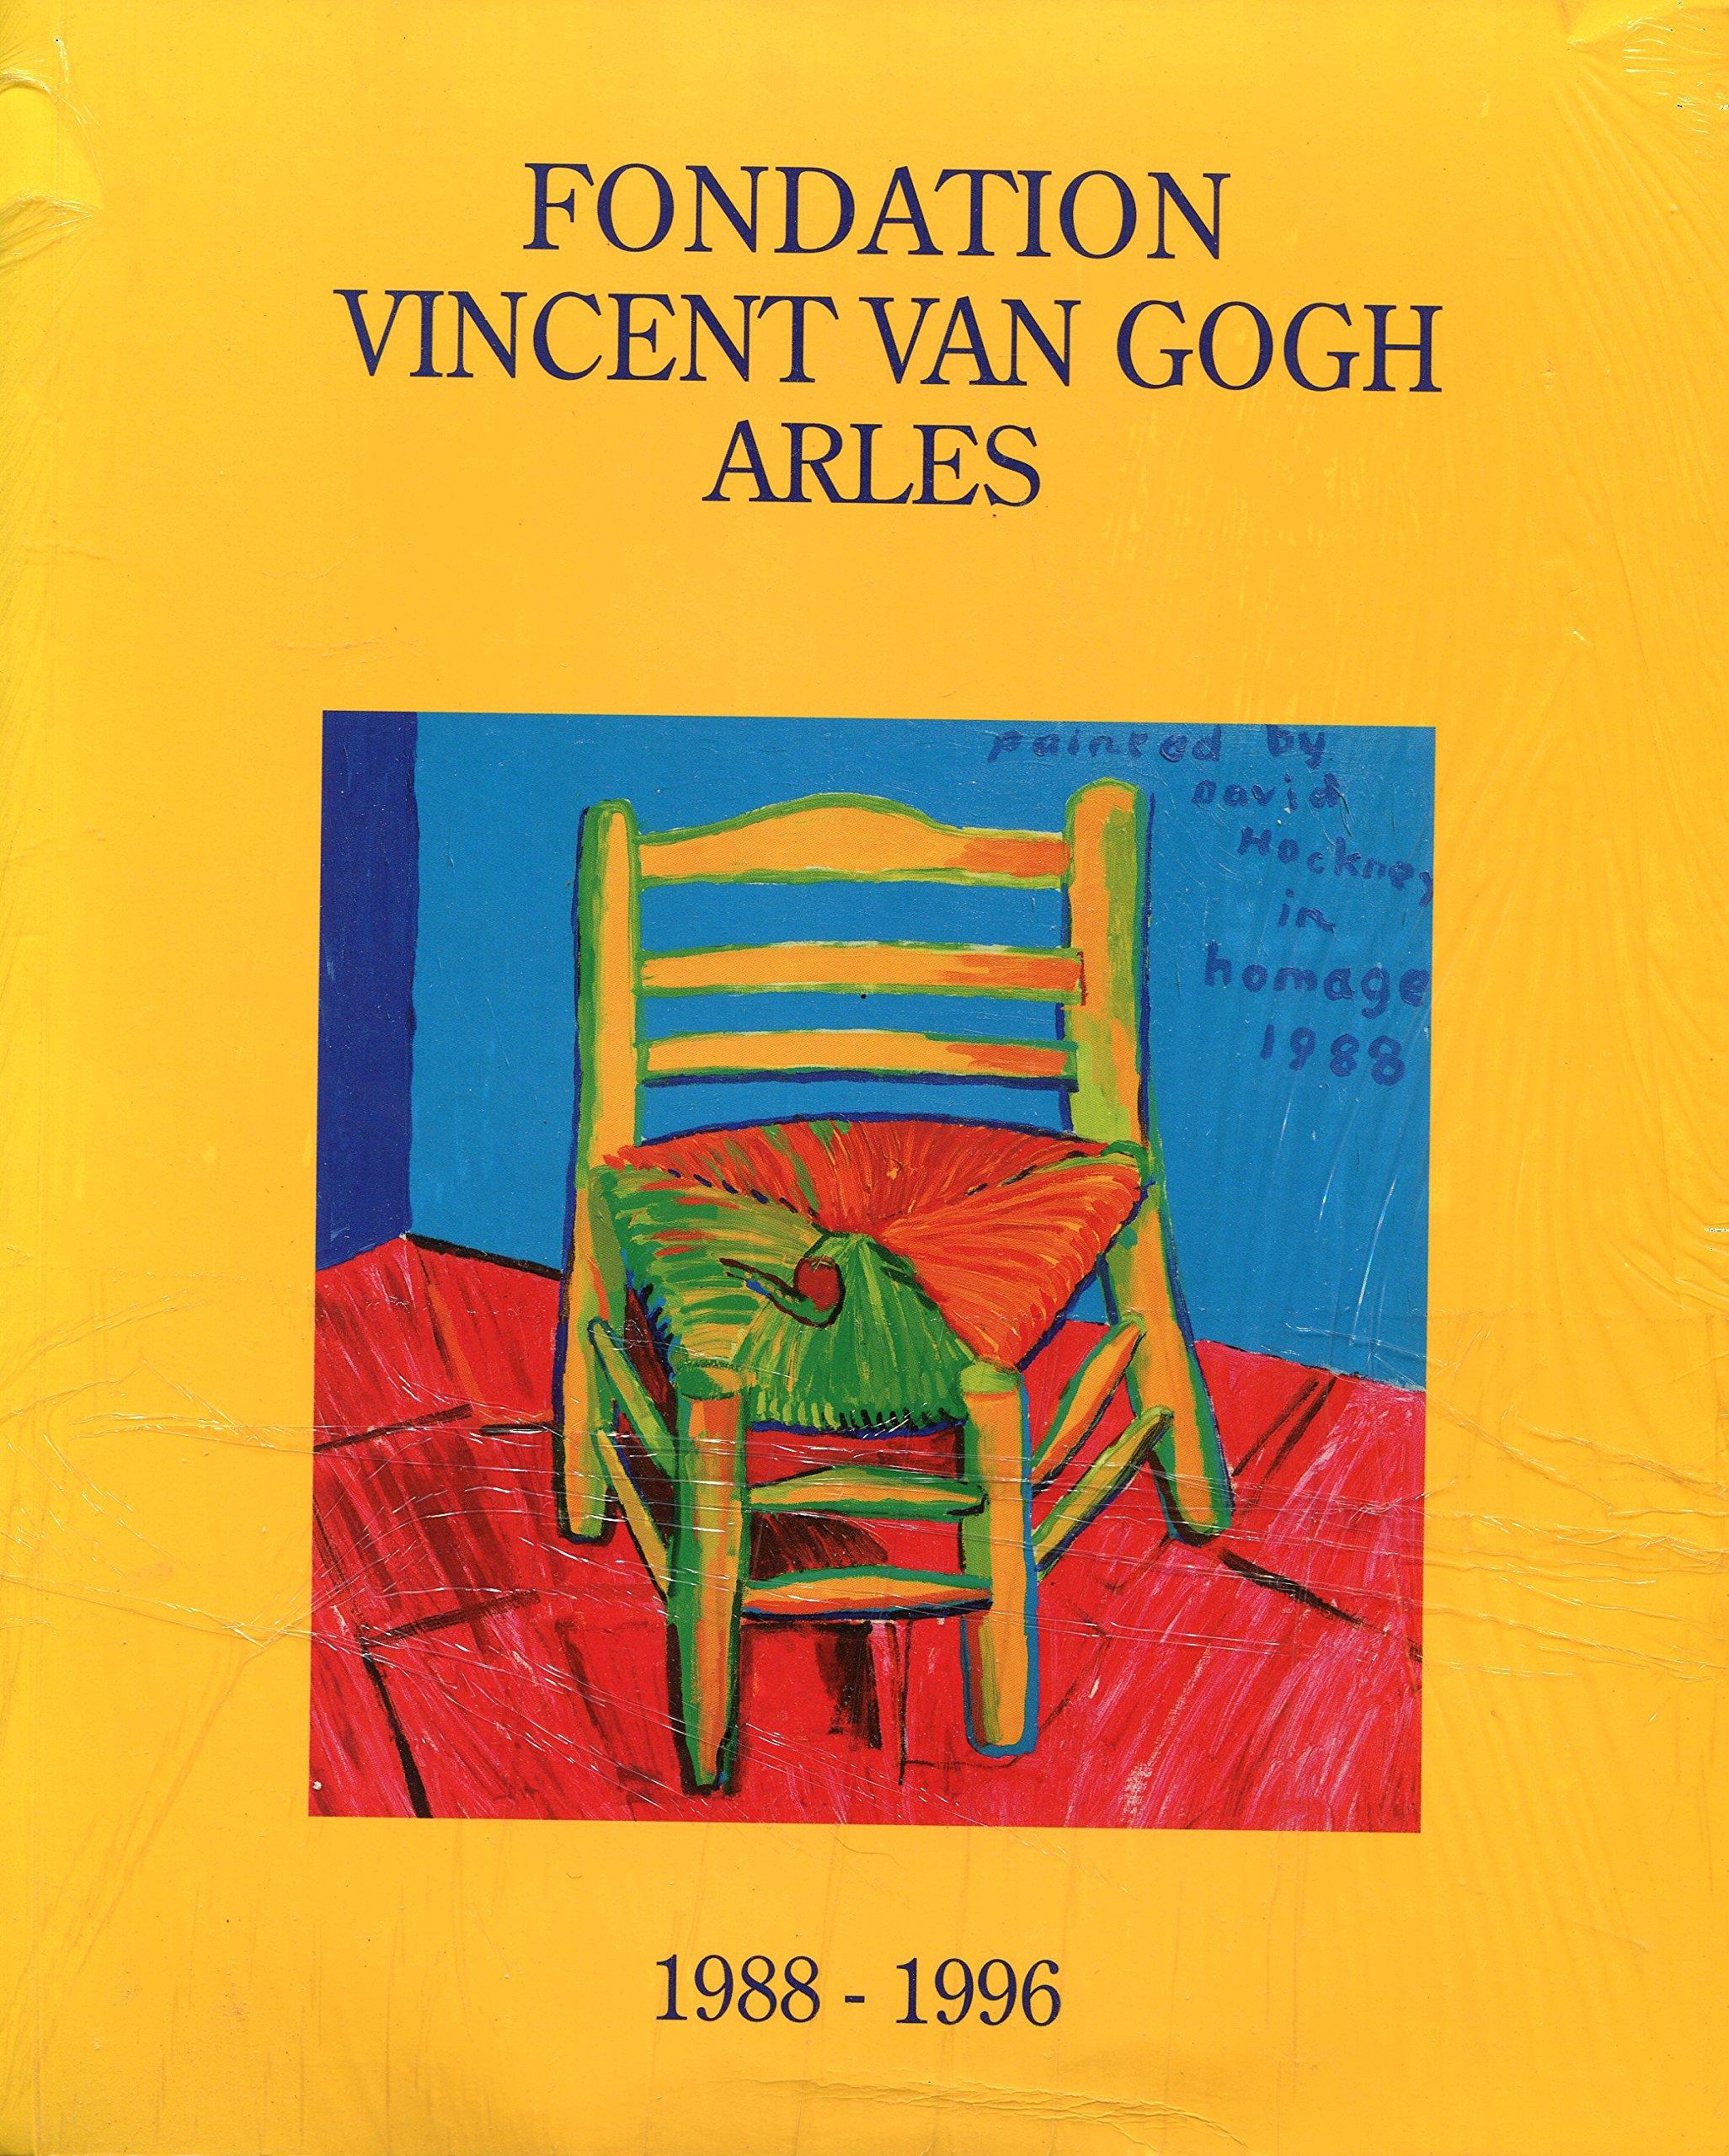 fondation vincent van gogh arles painted works sculptures 1988 1996